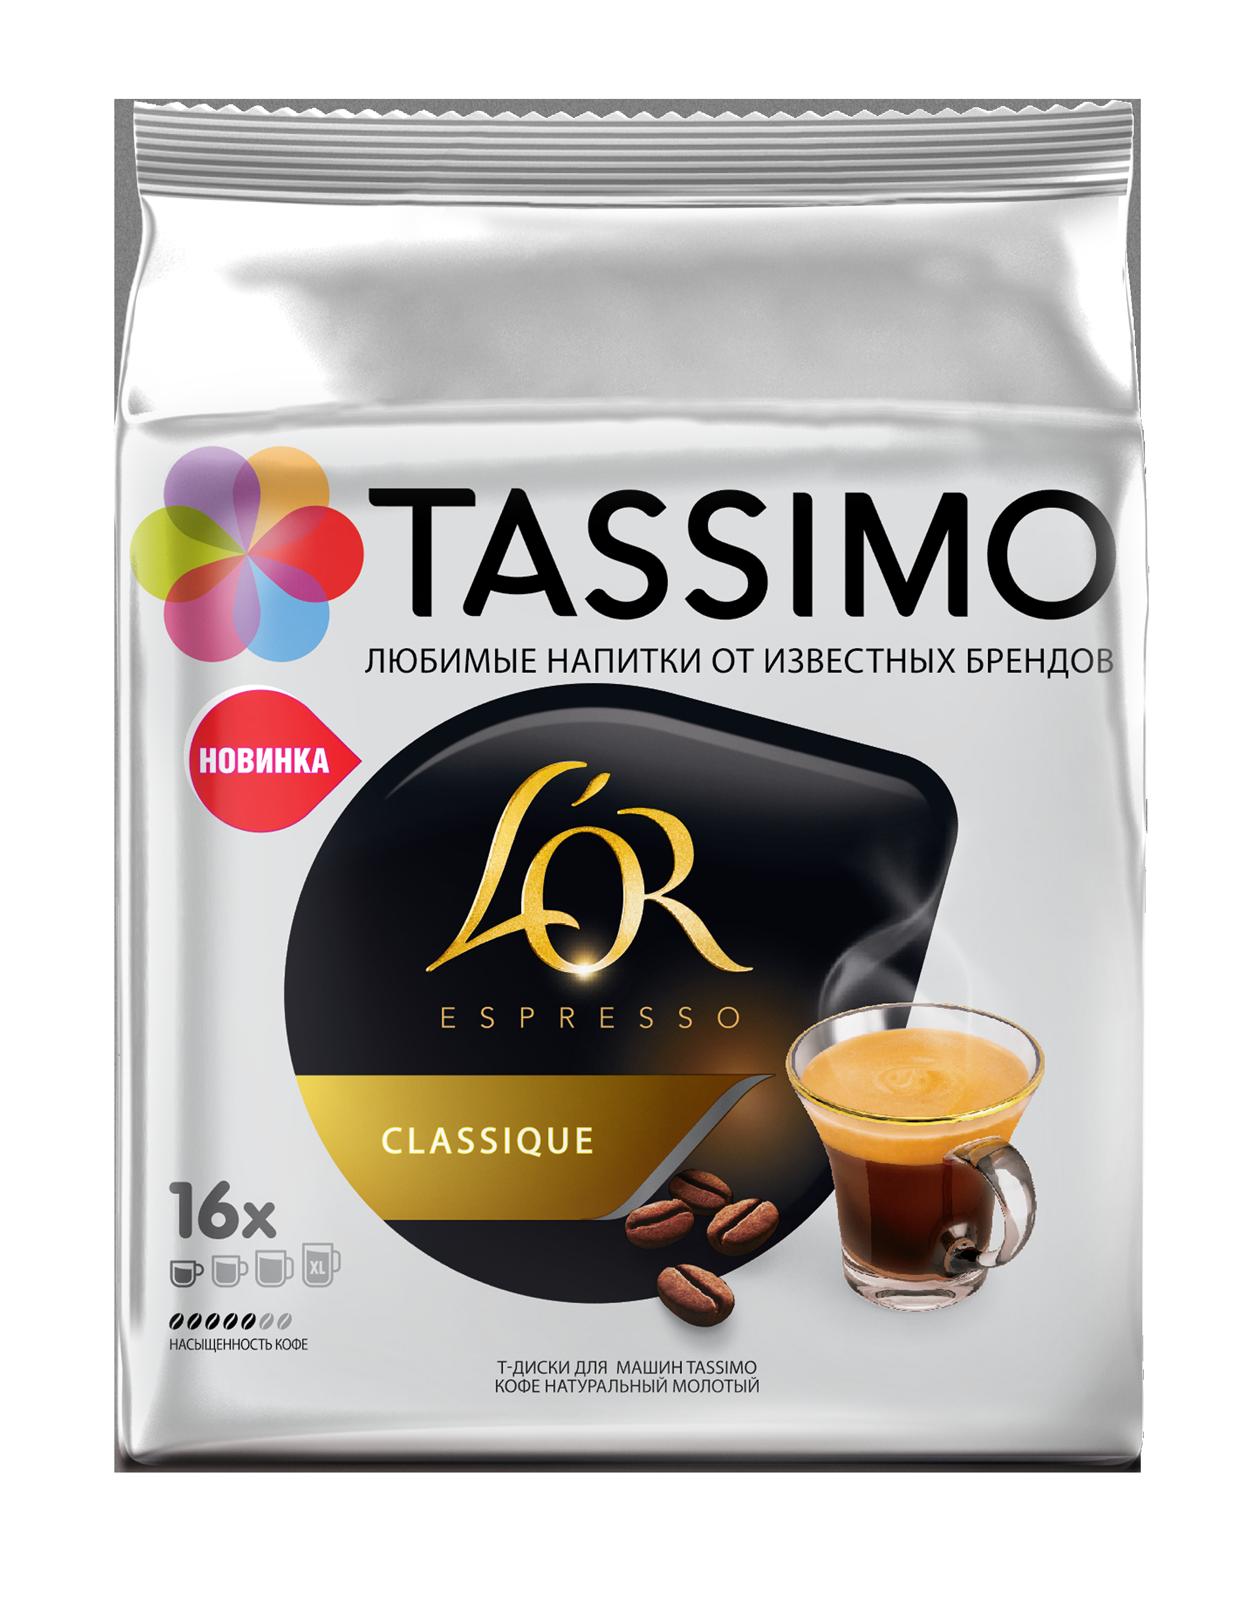 TASSIMO 'OR ESPRESSO CLASSIQUE